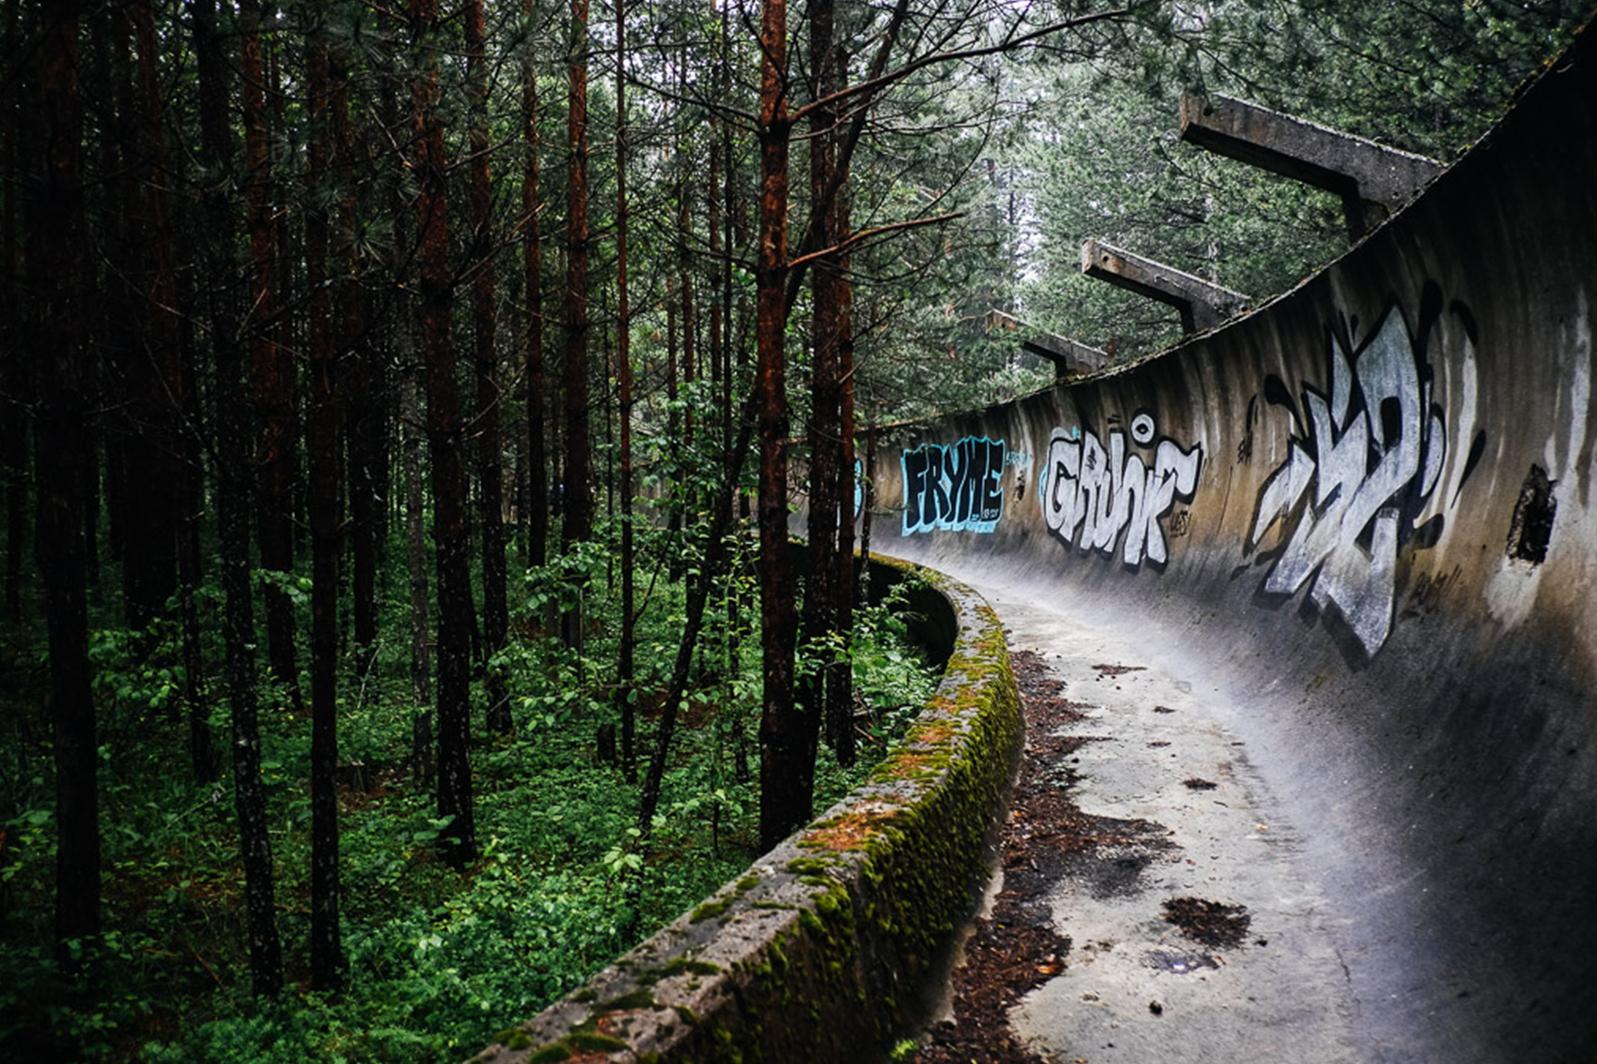 foret bobsleigh piste jo urbex - Berlin, Sarajevo, Athènes : les sites des Jeux Olympiques version urbex